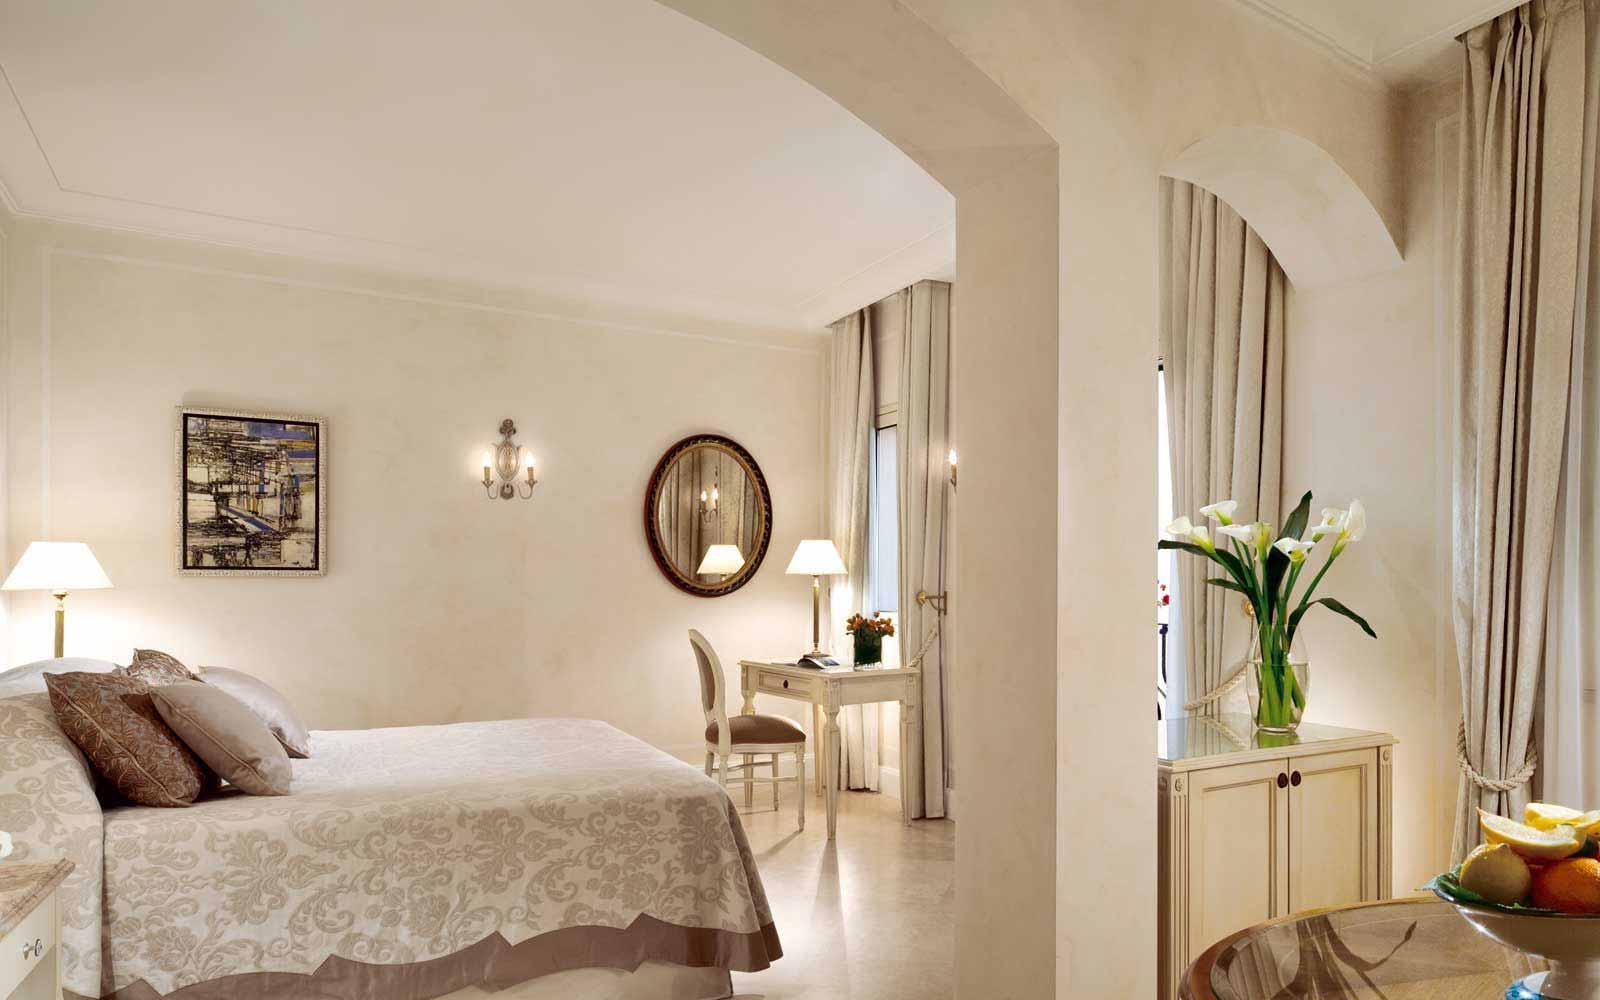 Deluxe room at Belmond Villa Sant' Andrea